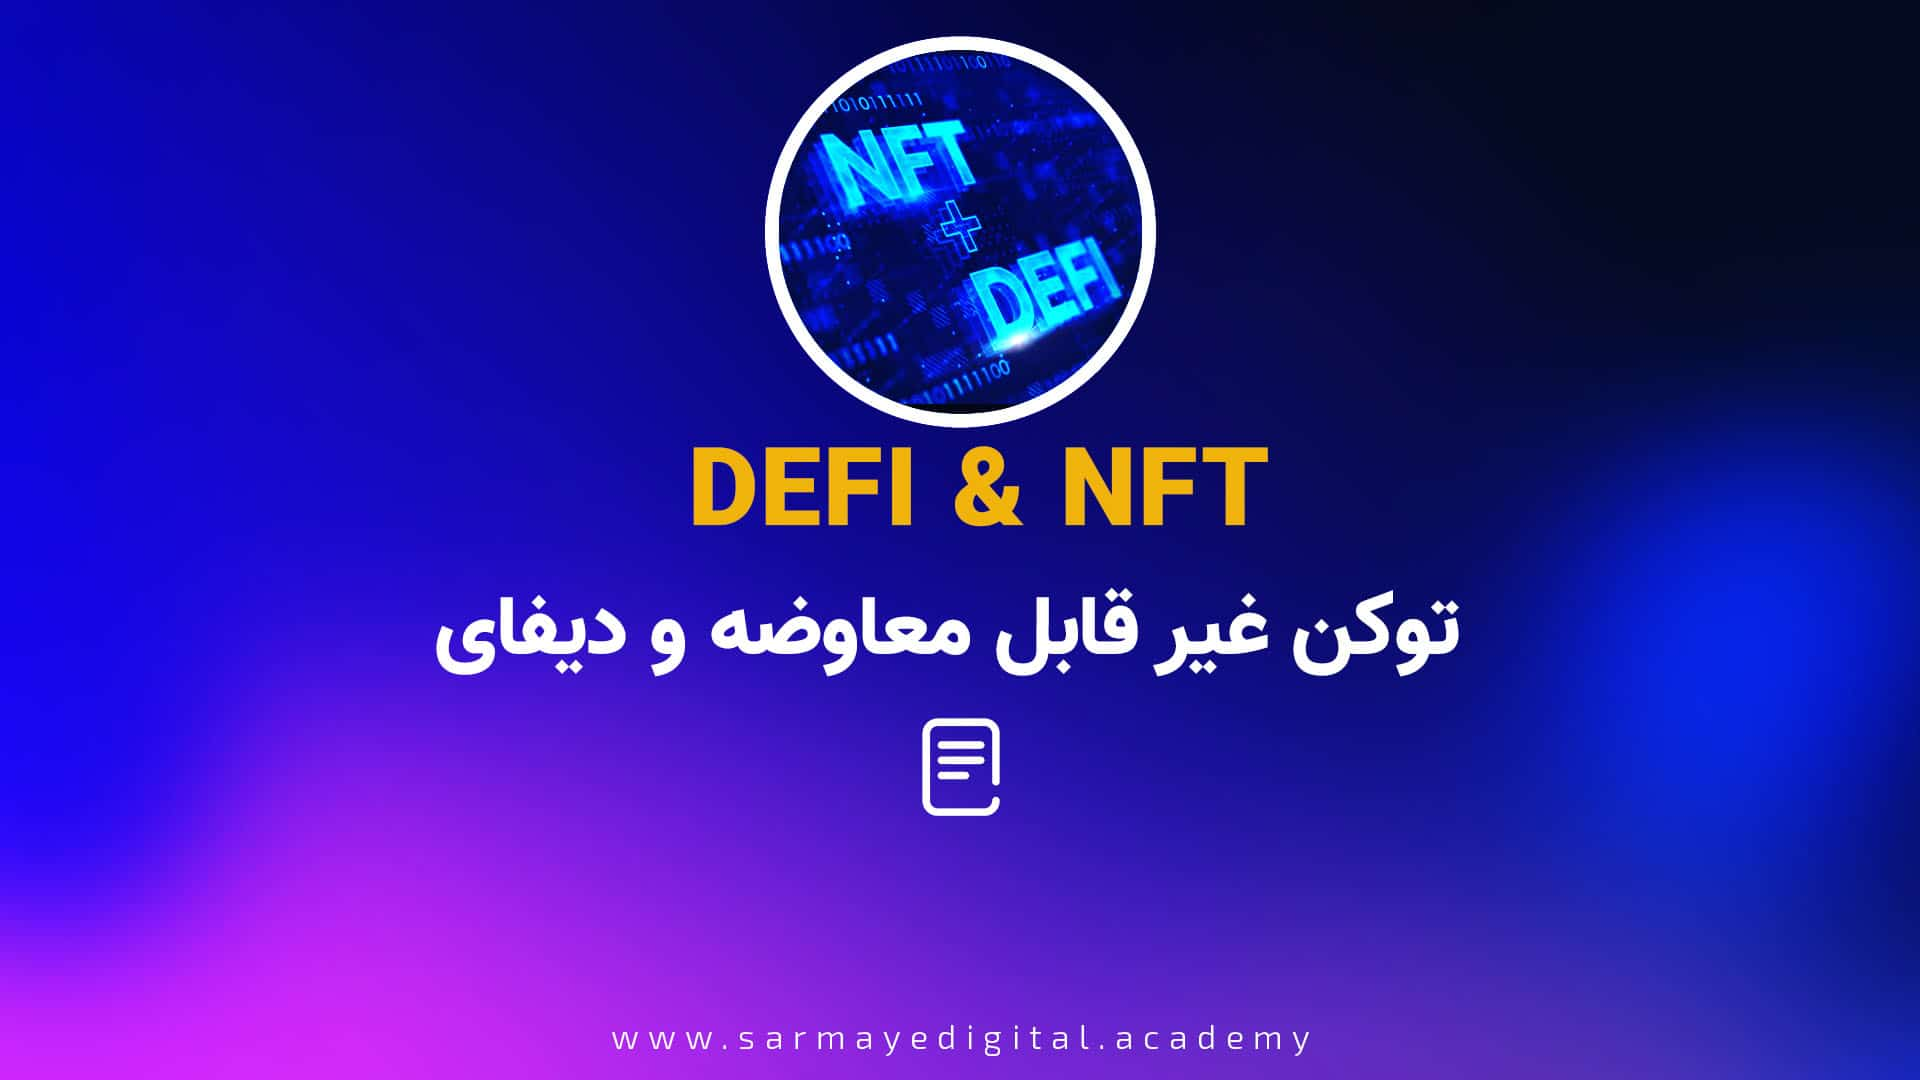 NFT و دیفای